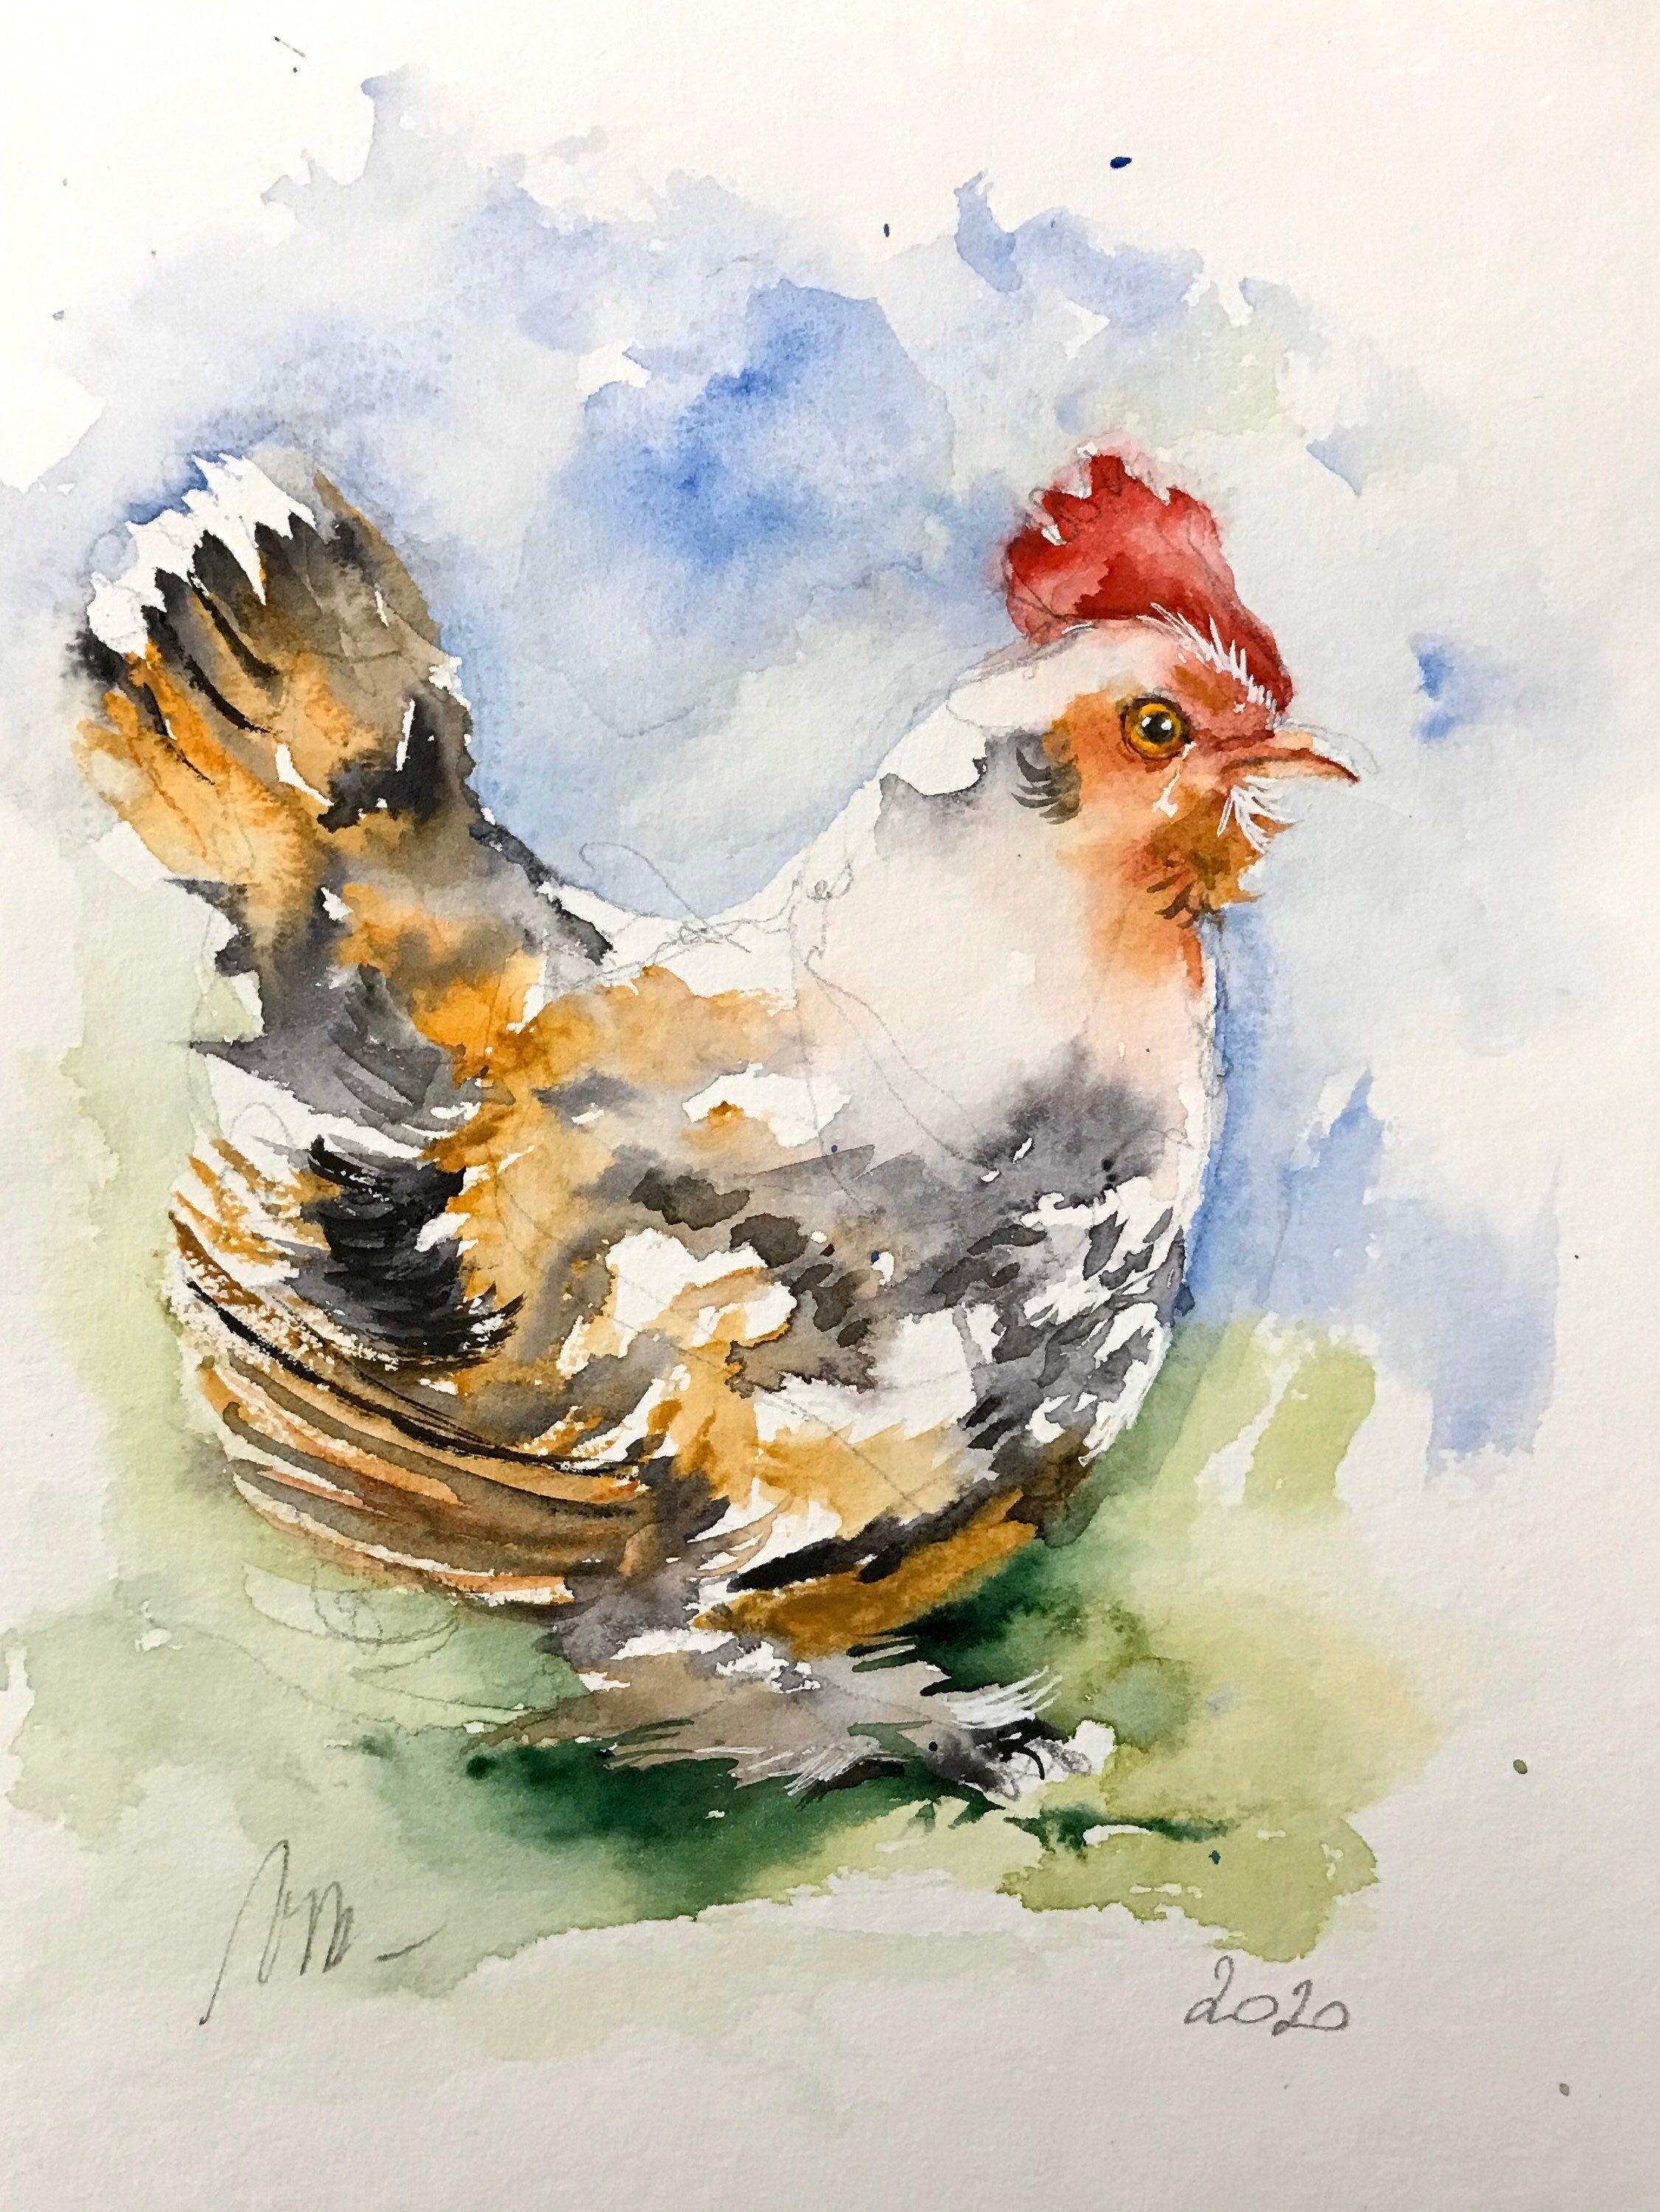 Aquarelle Peinture Originale Petite Poule Oiseau Ferme Basse